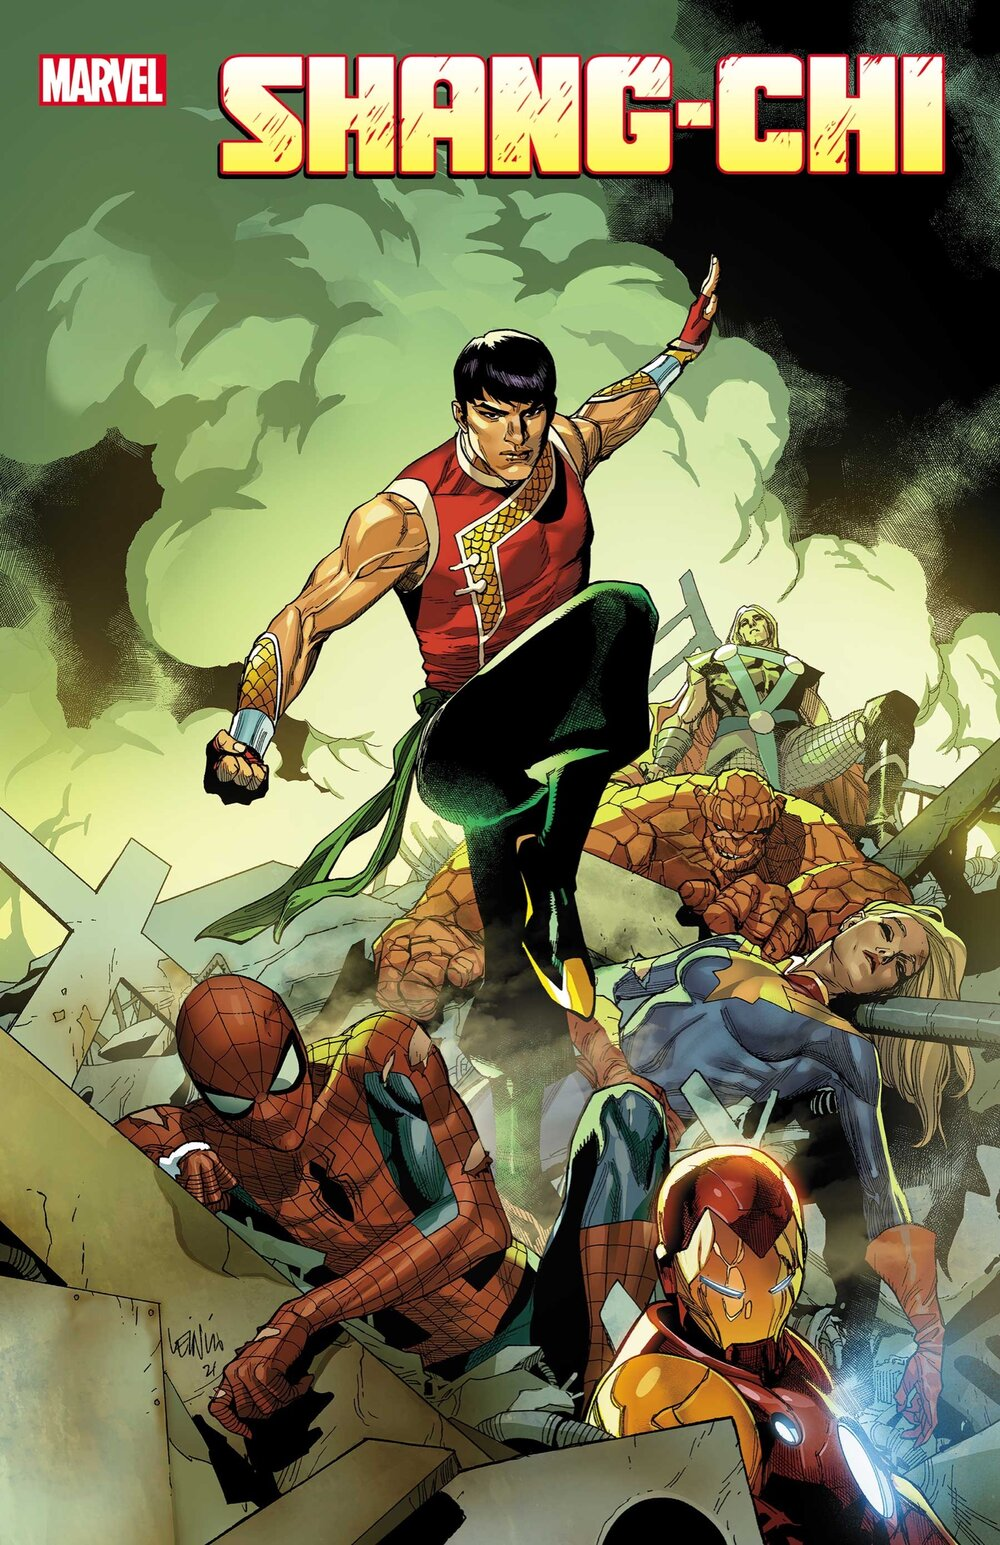 Photo credit: Marvel    SHANG-CHI #1    Written by GENE LUEN YANG    Art by DIKE RUAN    Cover by LEINIL FRANCIS YU    On Sale 5/19